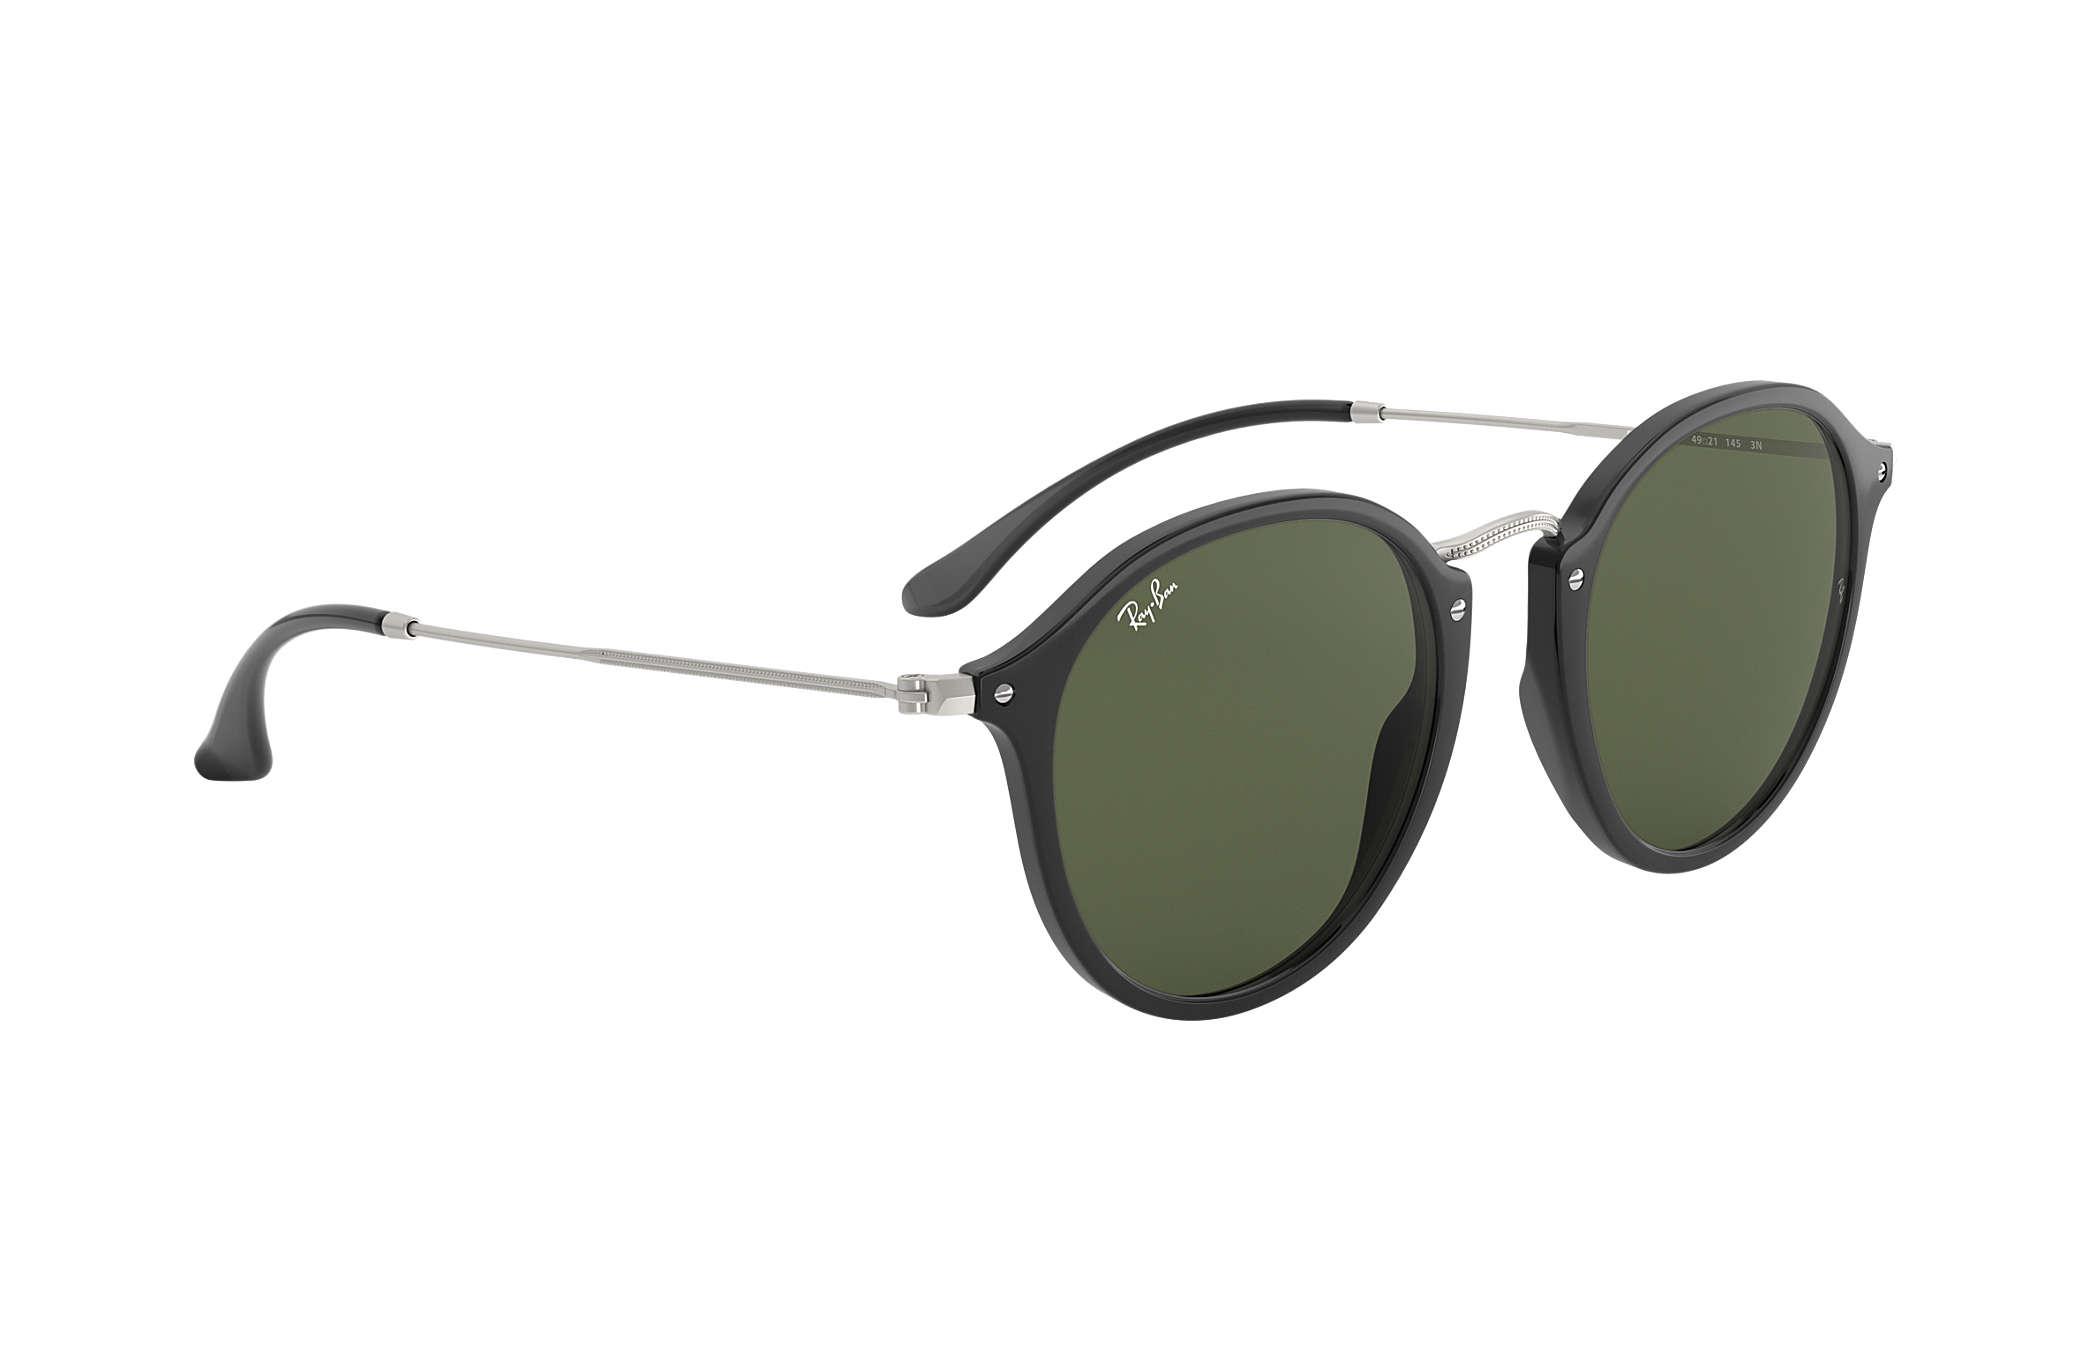 4996345d4f5e Ray-Ban Round Fleck RB2447 Black - Acetate - Green Lenses ...